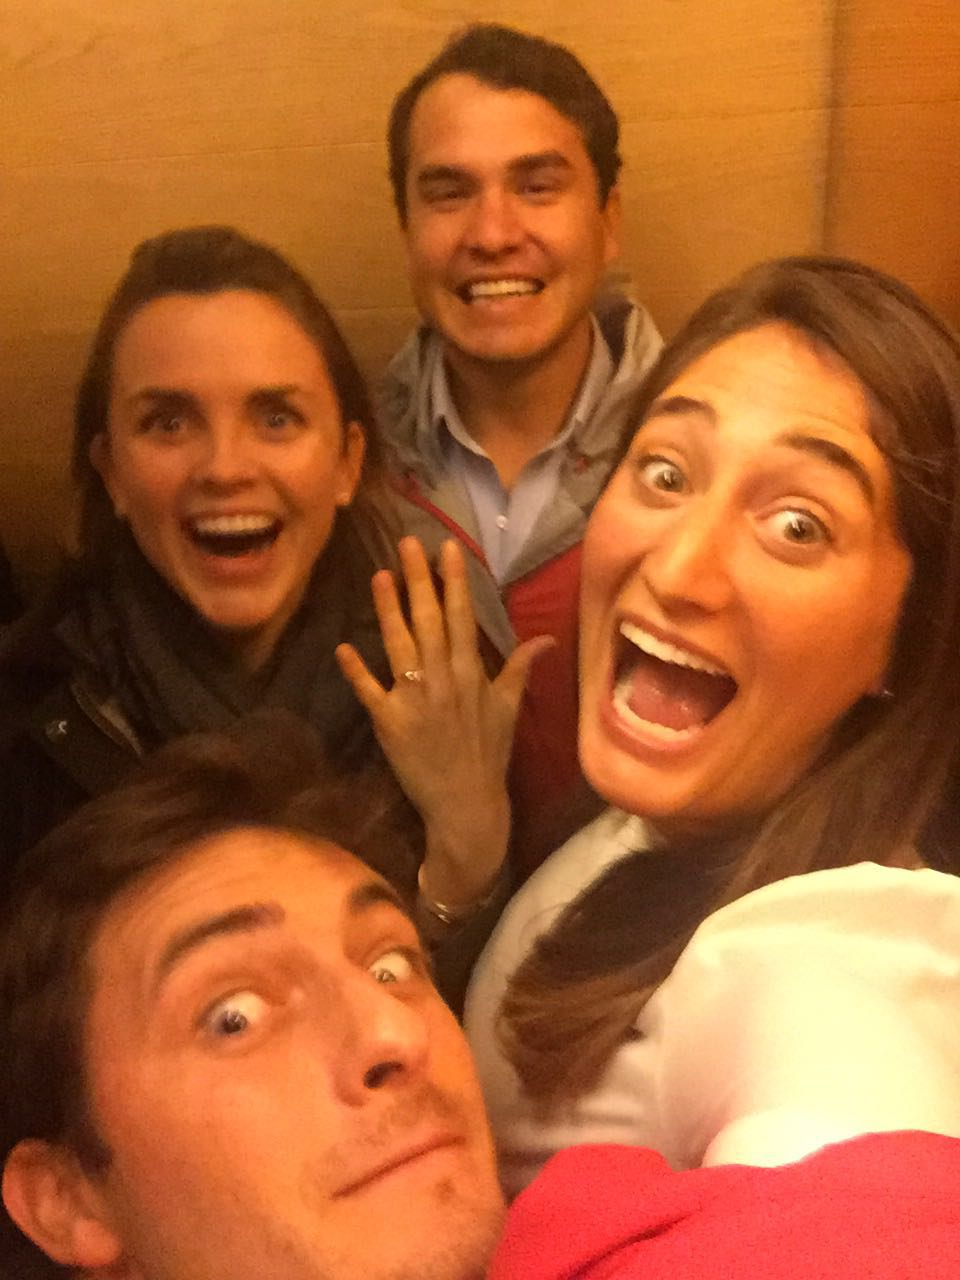 Engagement elevator selfie